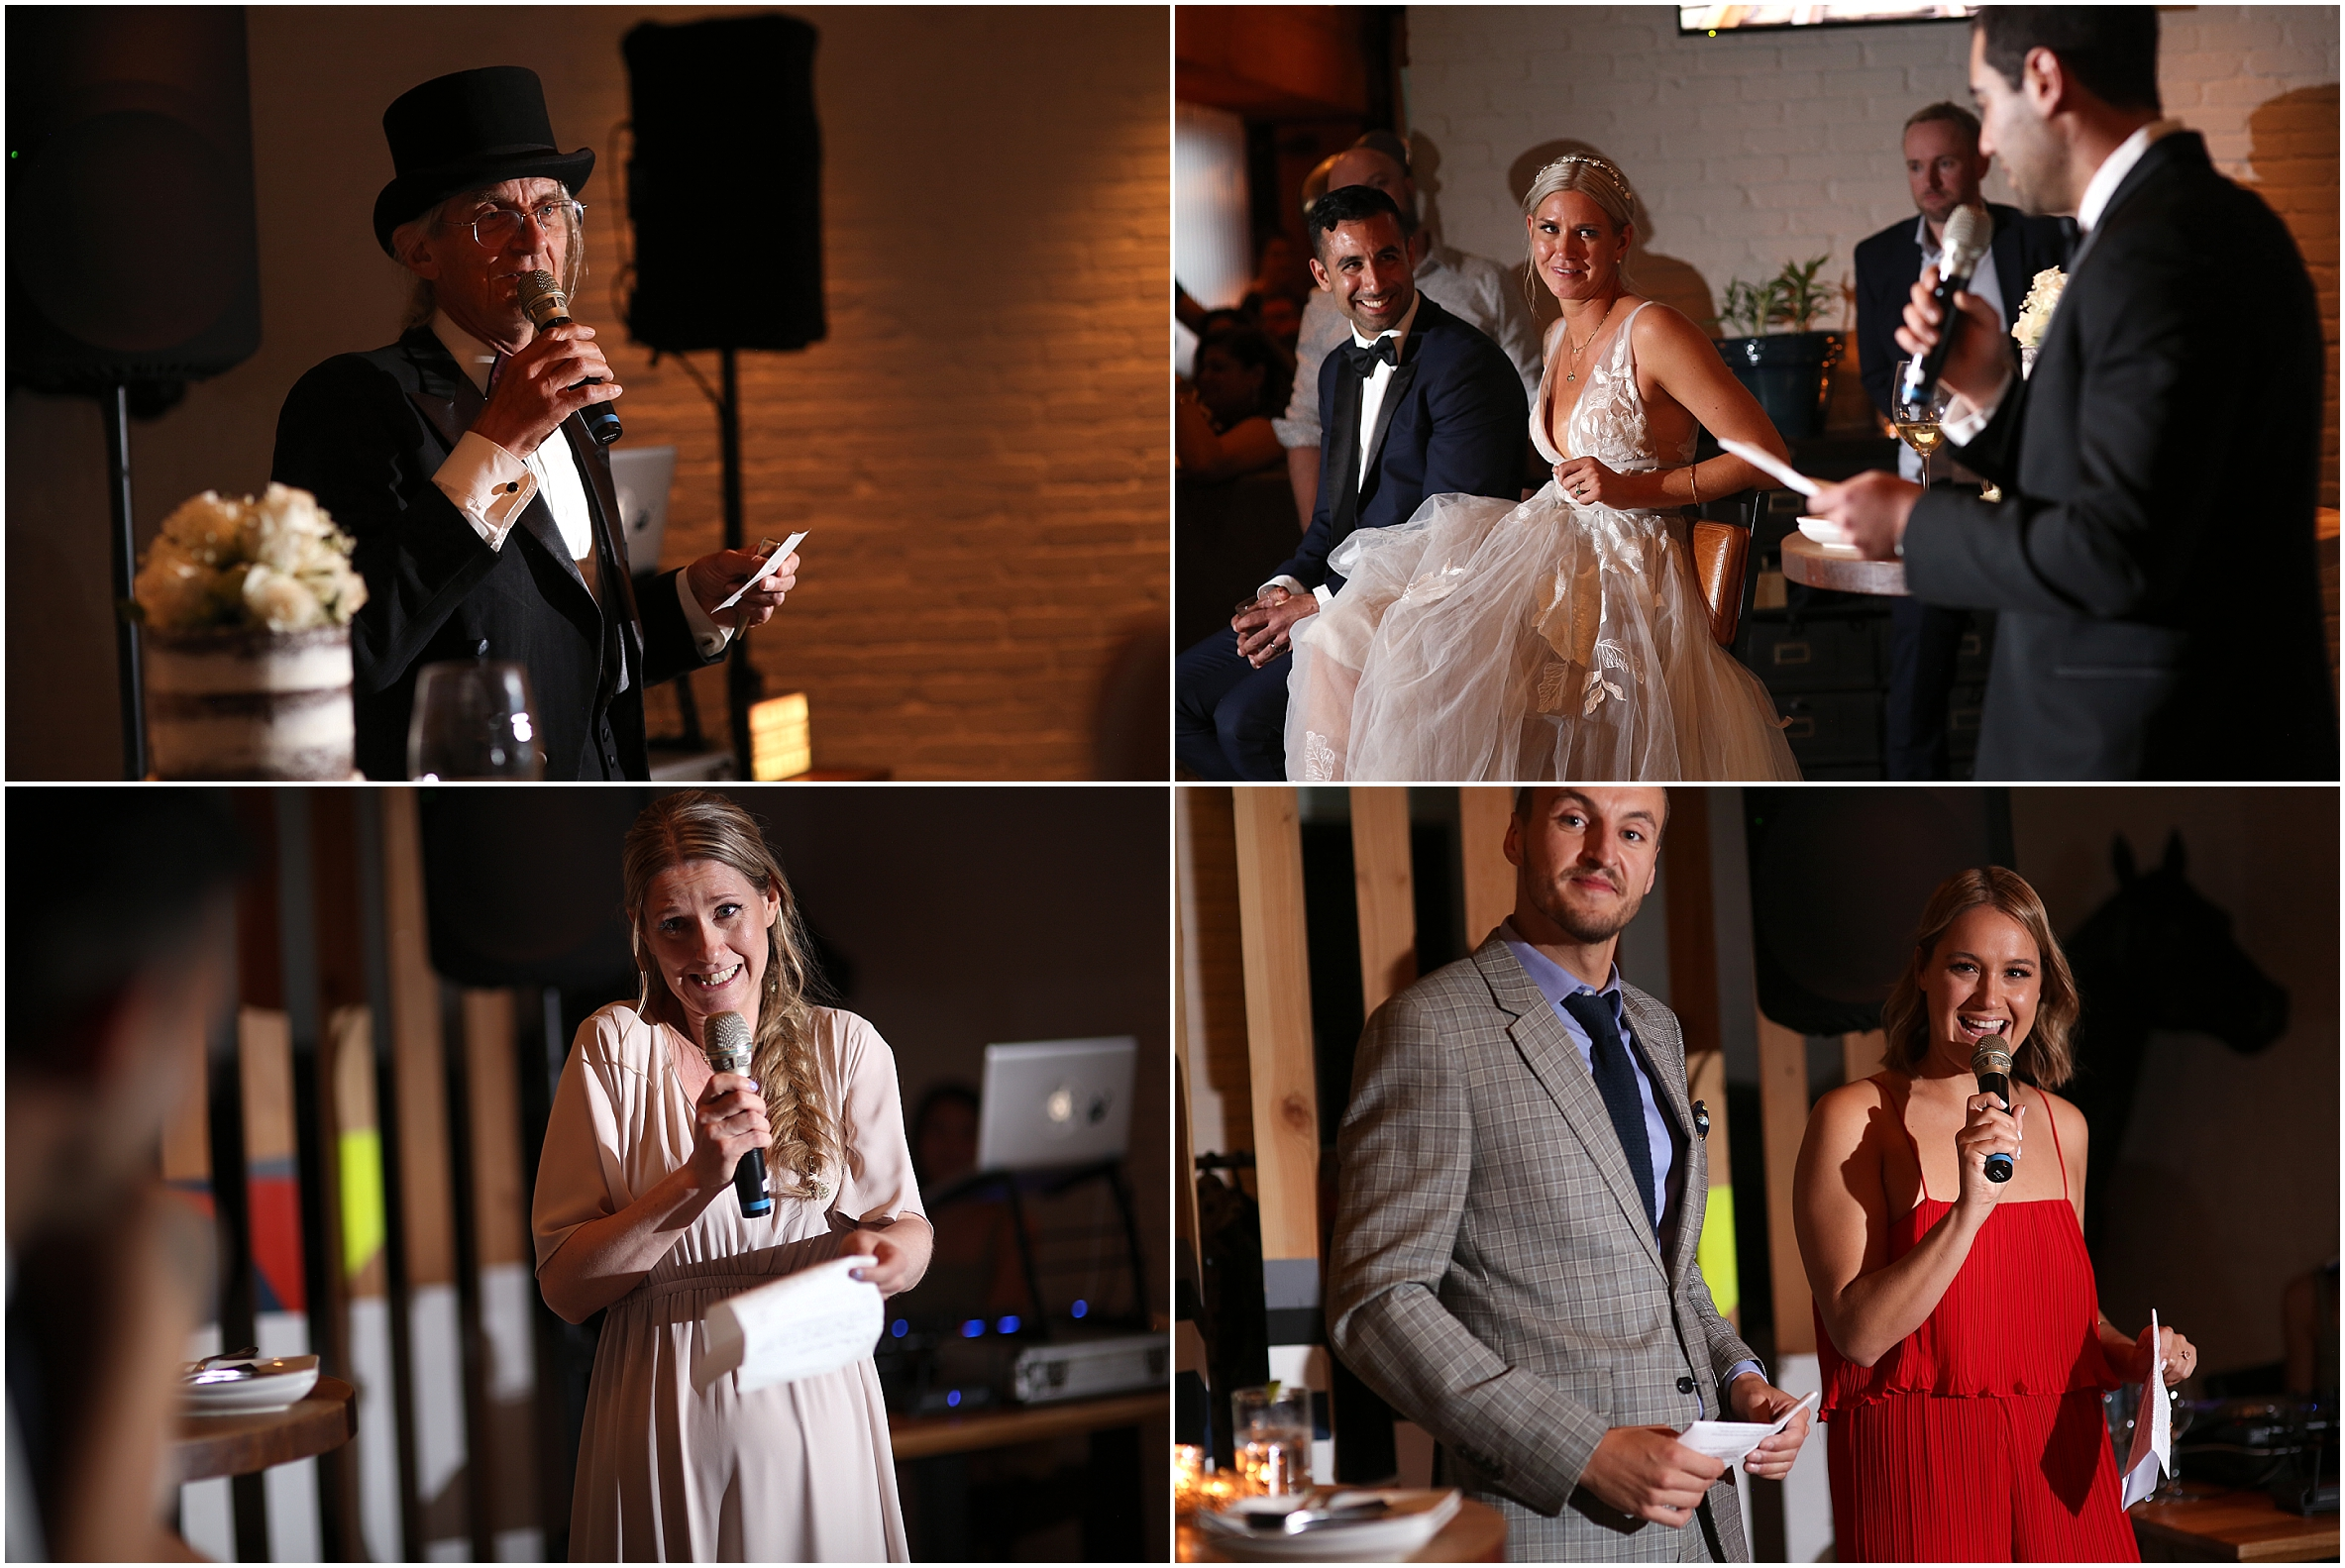 vancouver-wedding-photographer-the-loft-earls-yaletown_0027.jpg